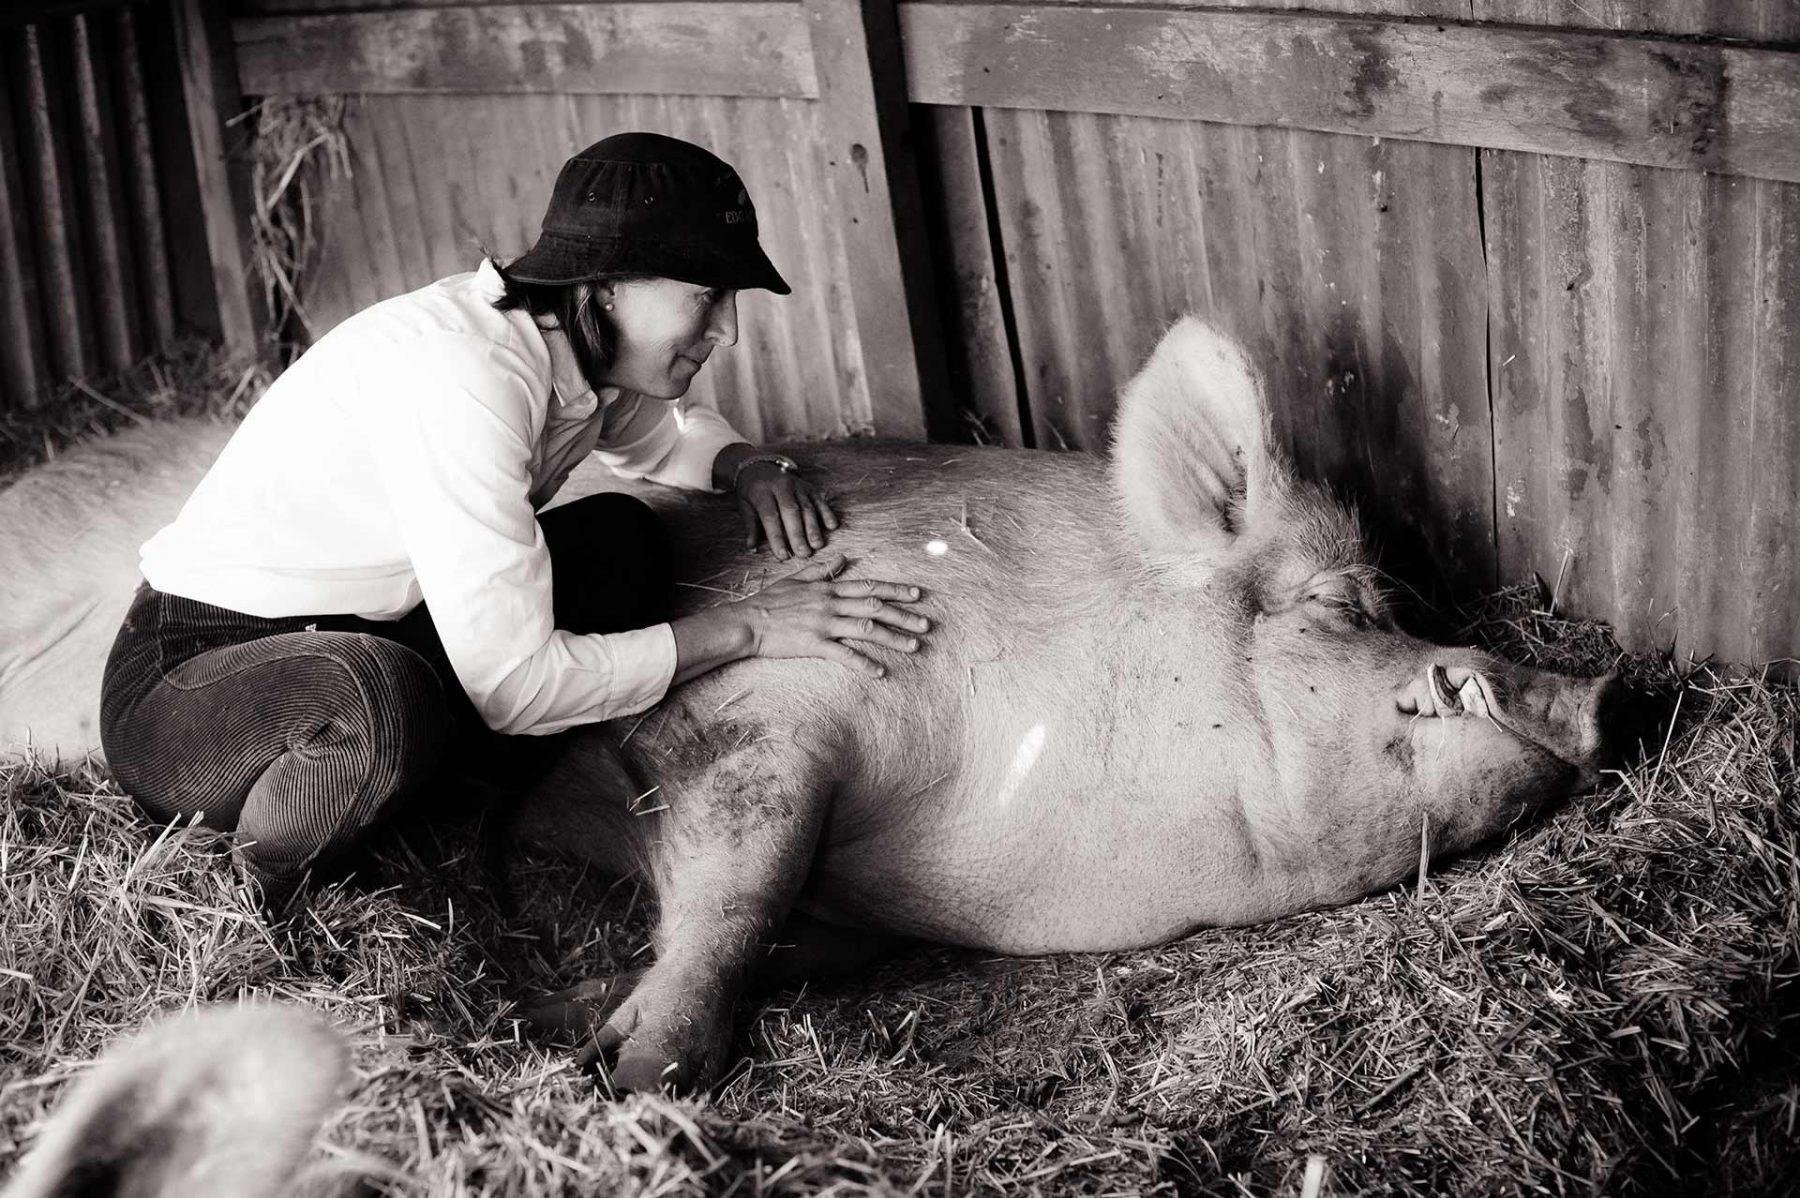 Edgar's Mission founder Pam Ahern with Edgar the Pig. Australia, 2010